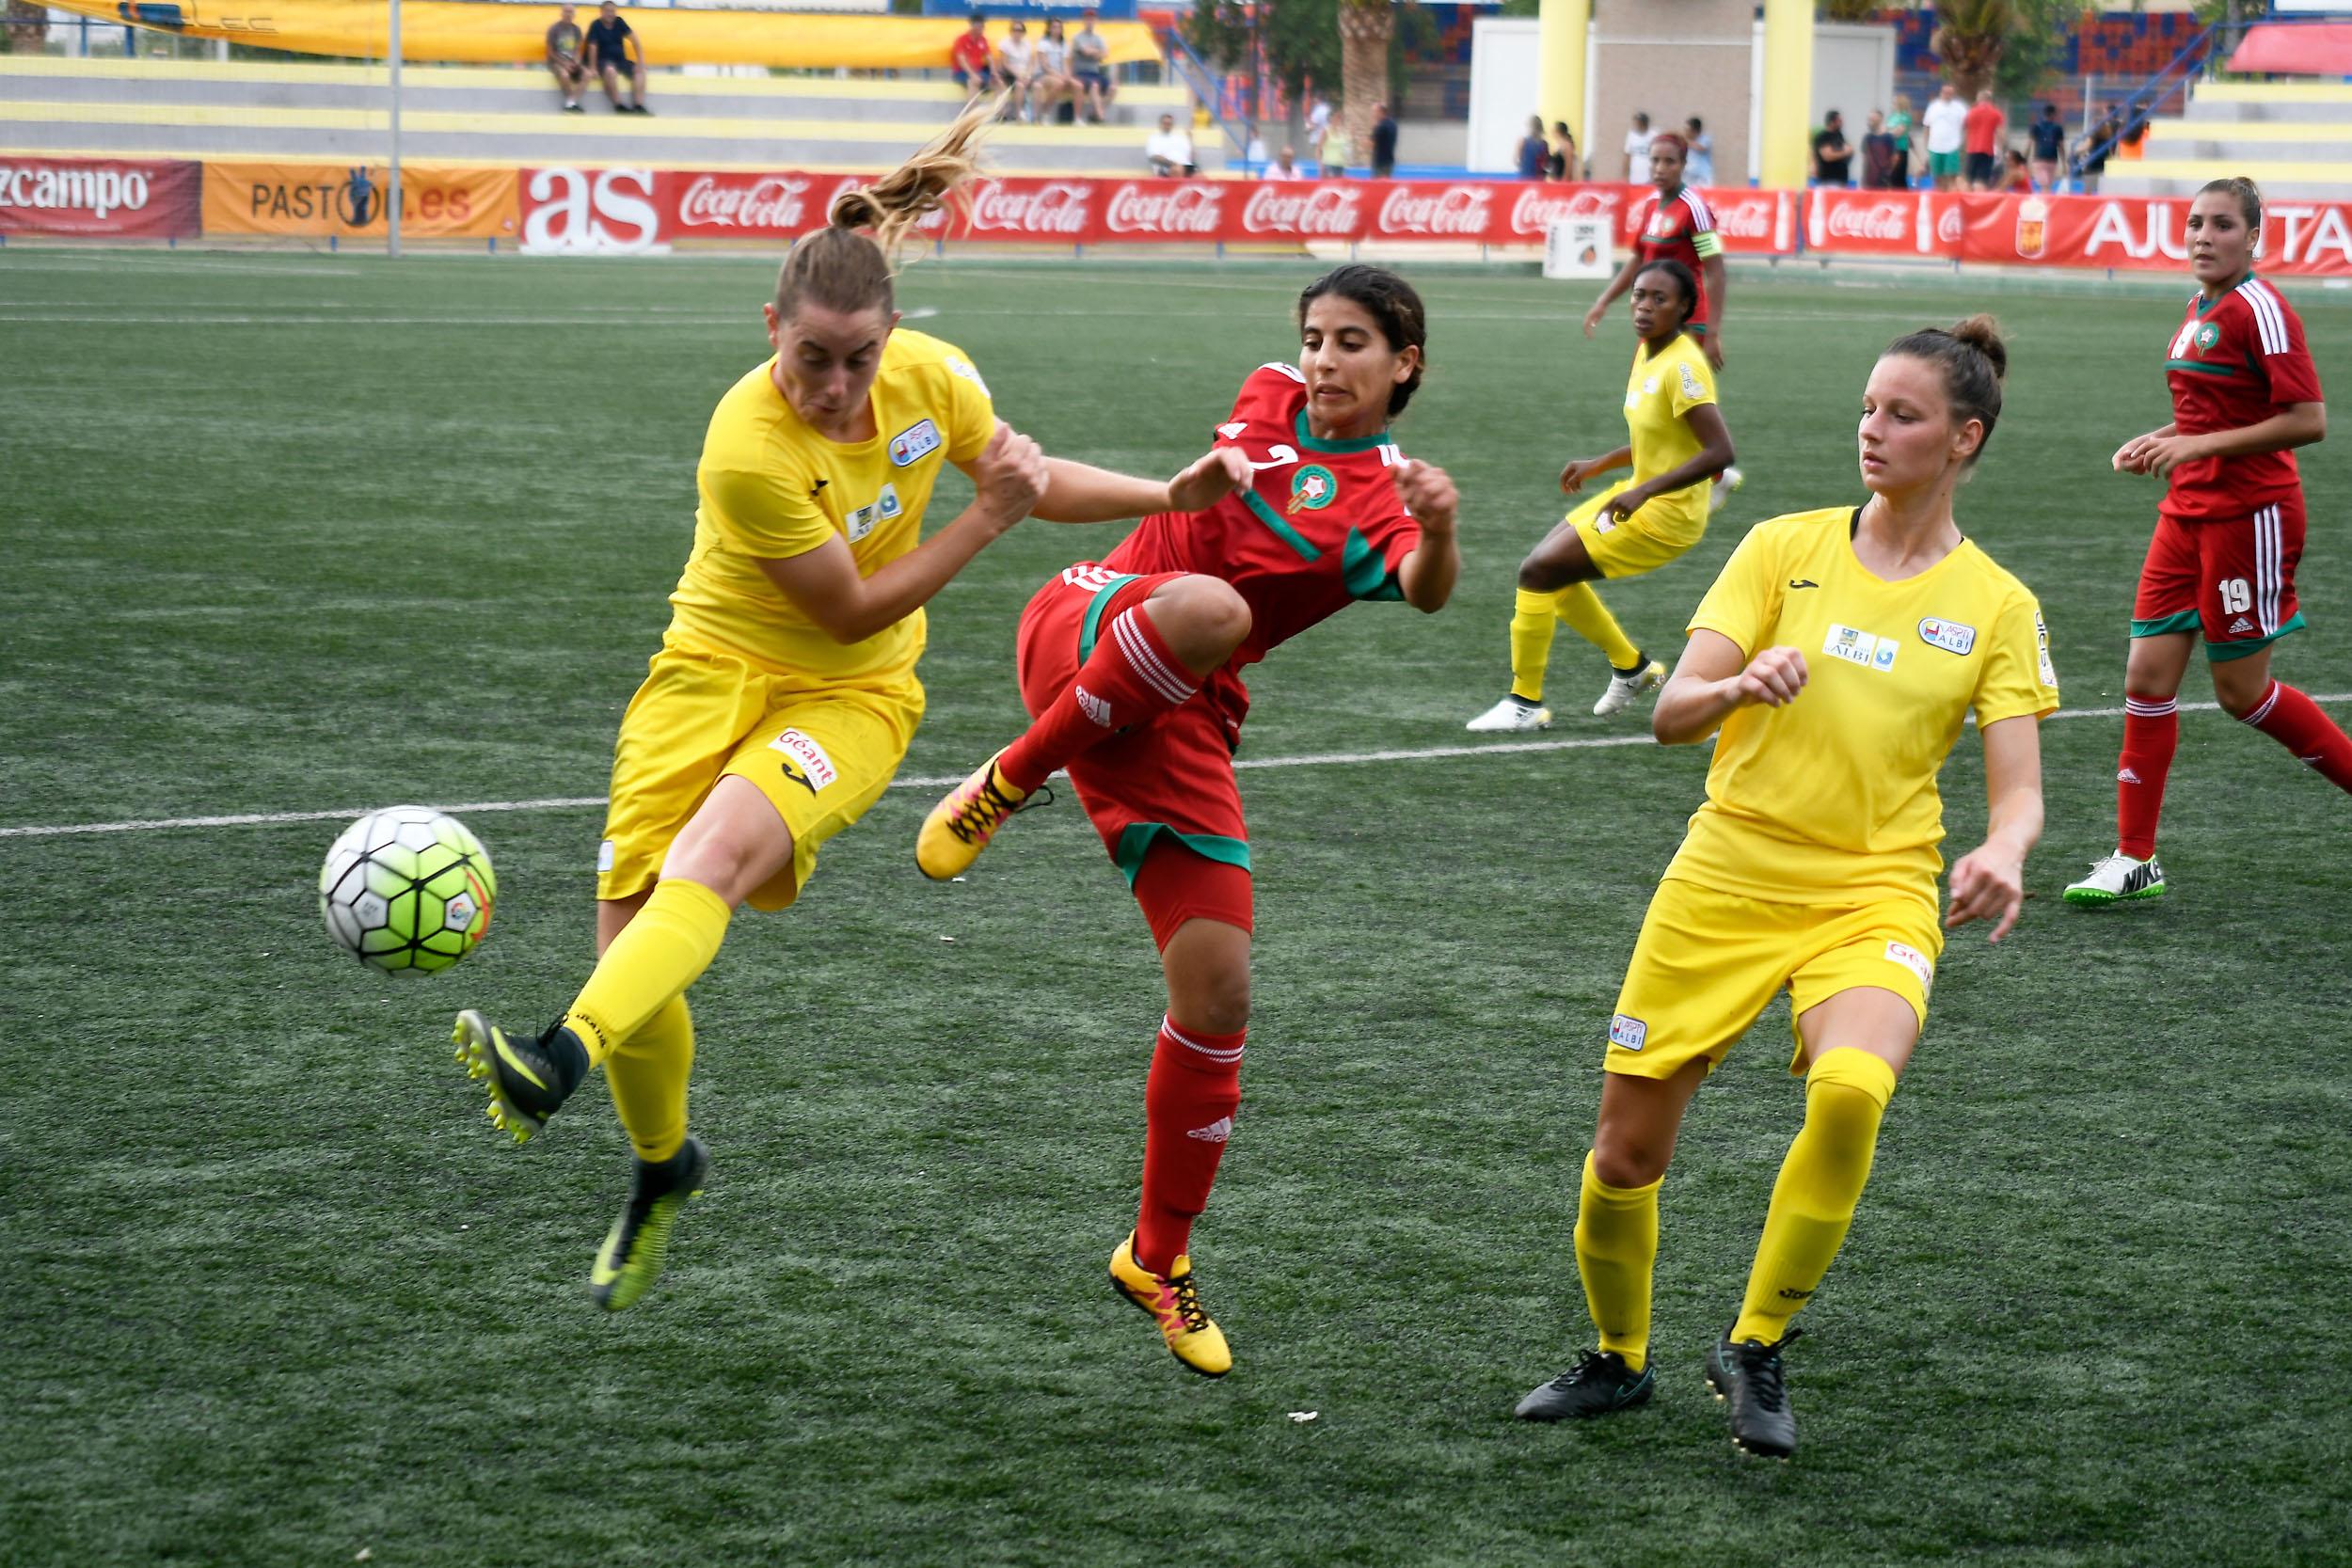 Albi battu par le Maroc (1-5)